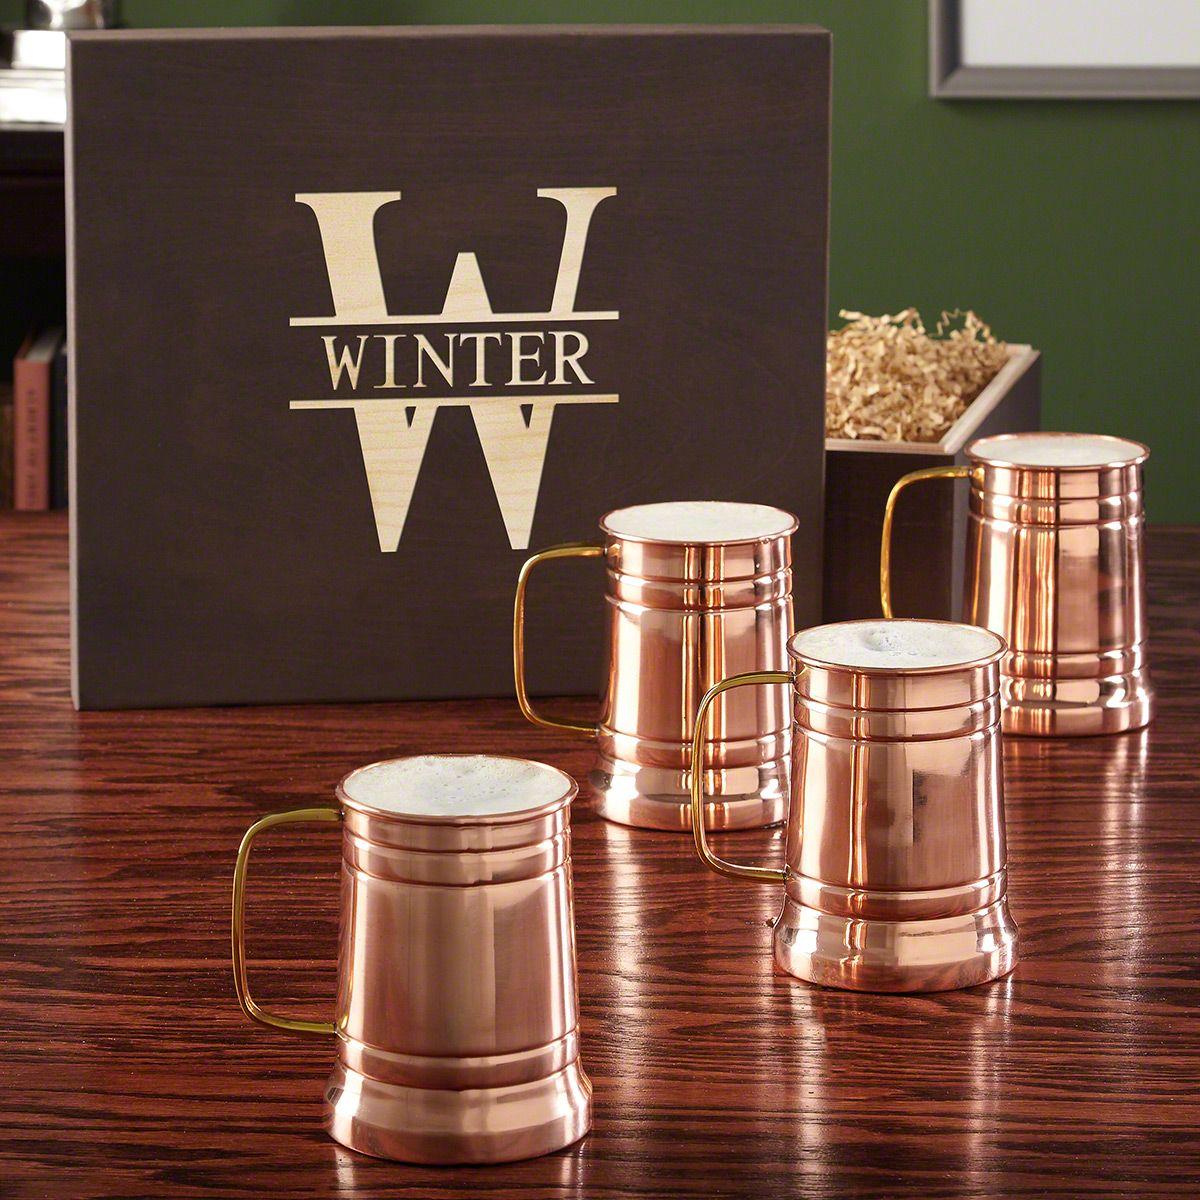 Oakmont Gift Box and Koln Beer Tankard Set